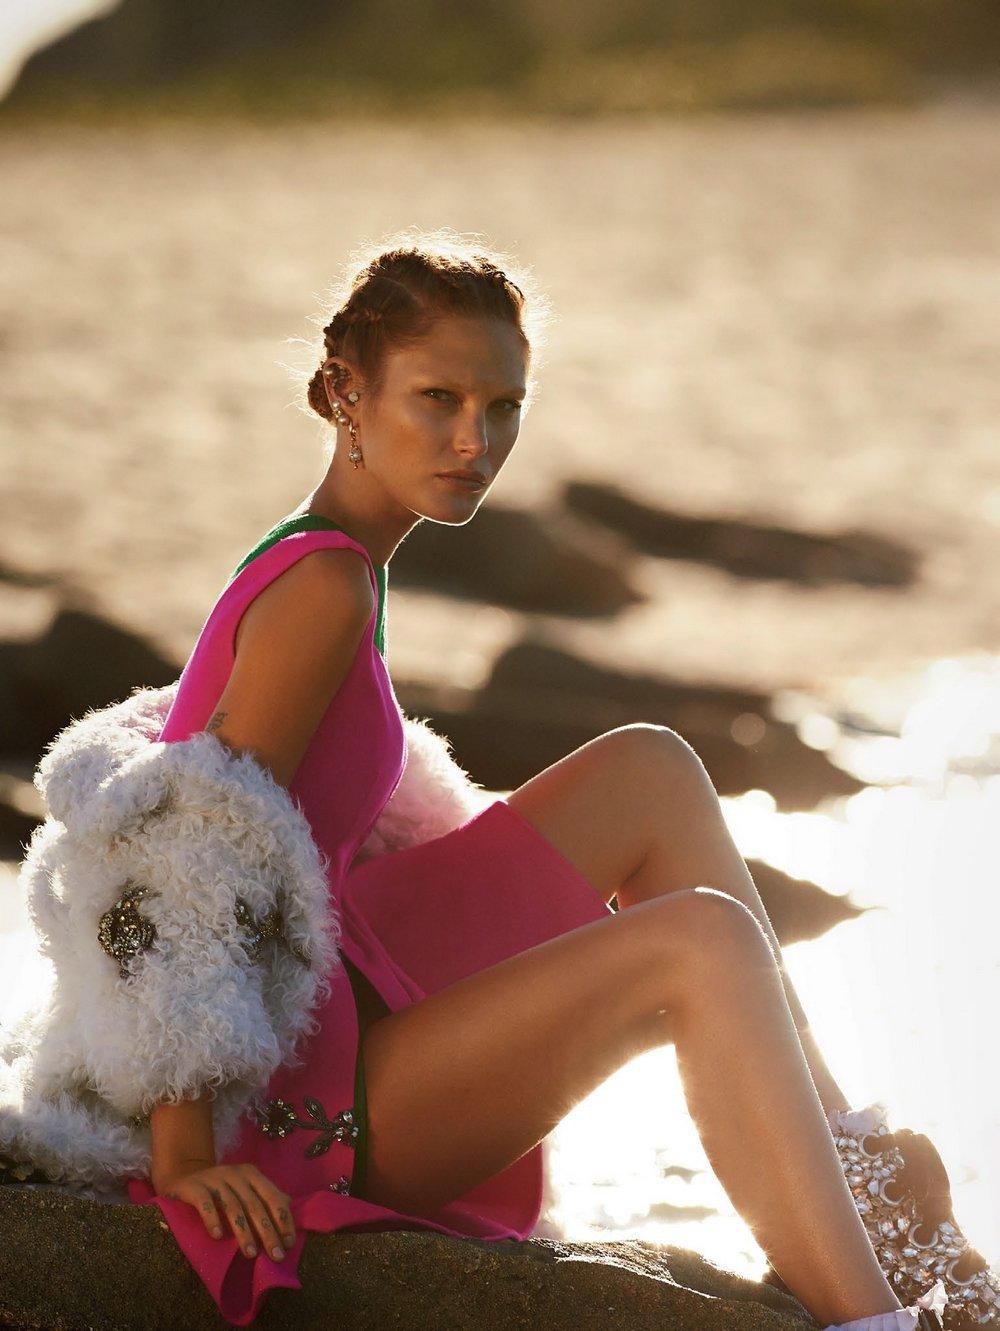 Catherine-McNeil-by-Gilles-Bensimon-for-Vogue-Australia-October-2014-7.jpg